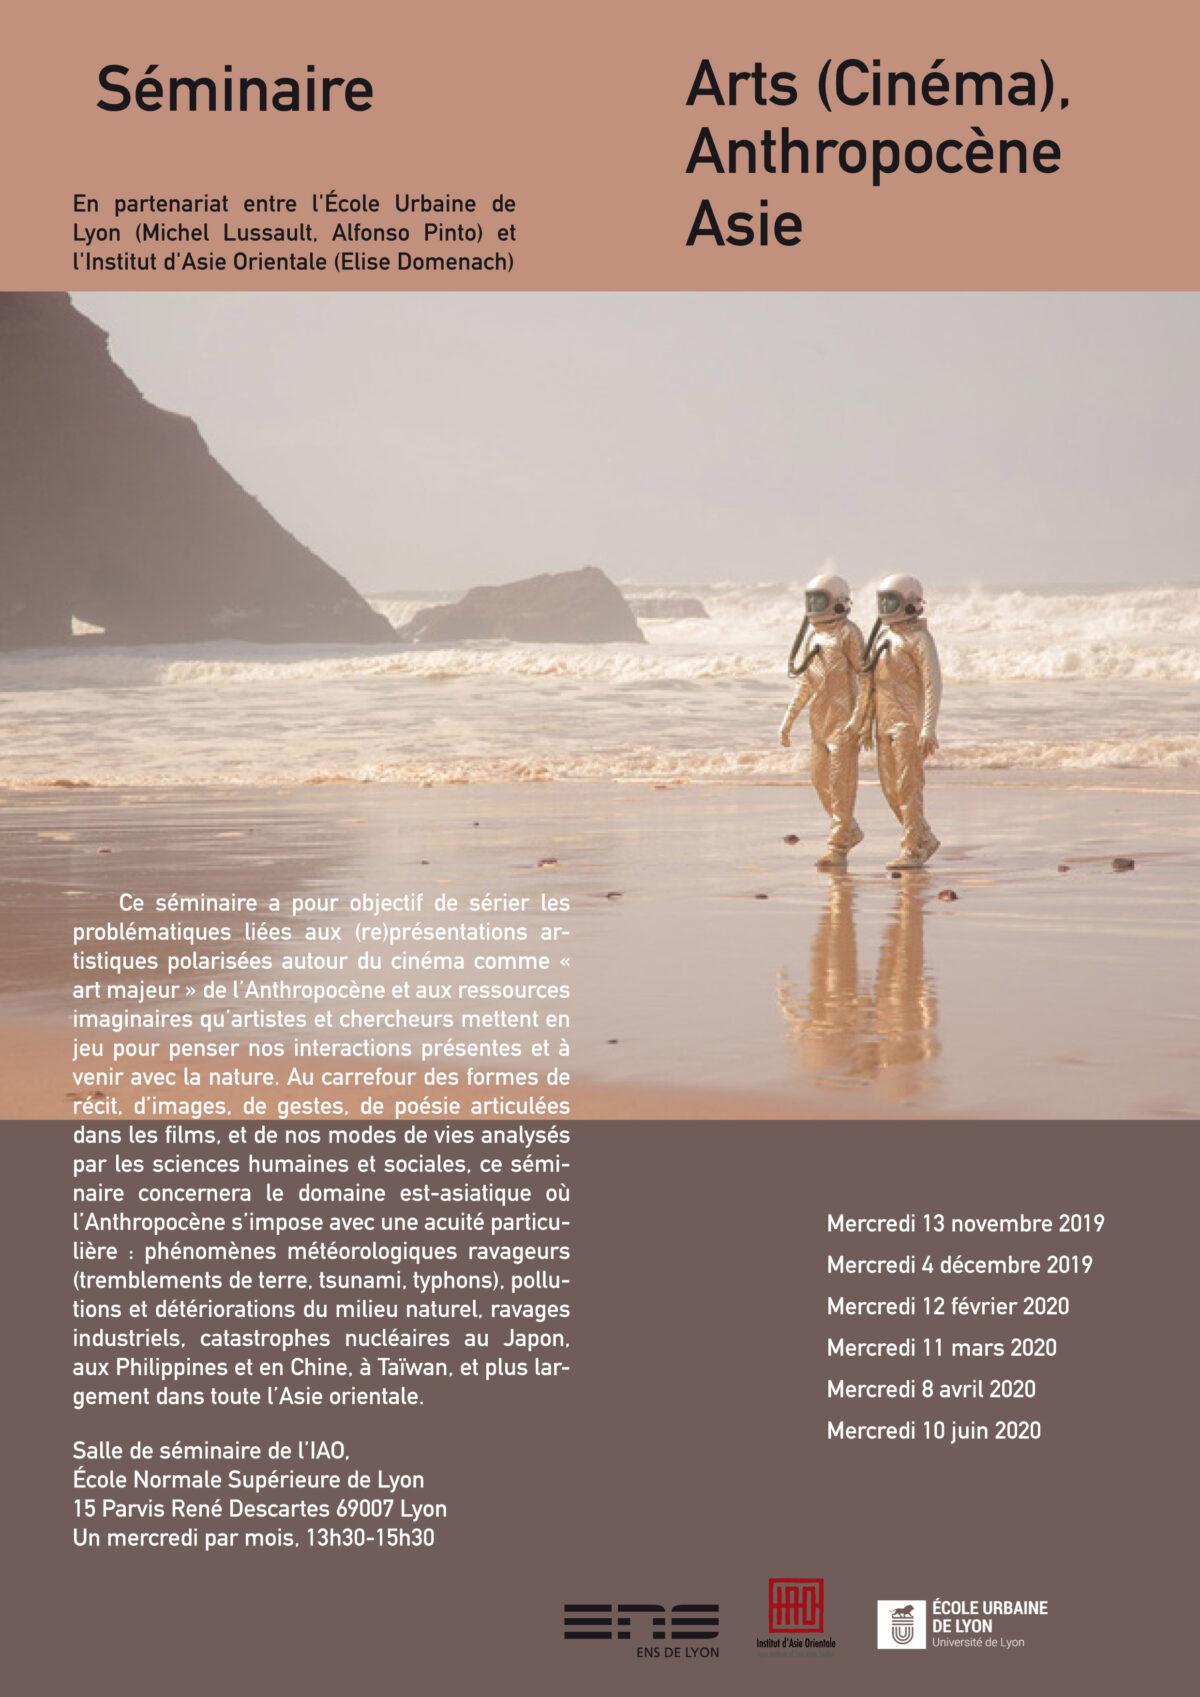 Séminaire « Arts (Cinéma), Anthropocène, Asie »